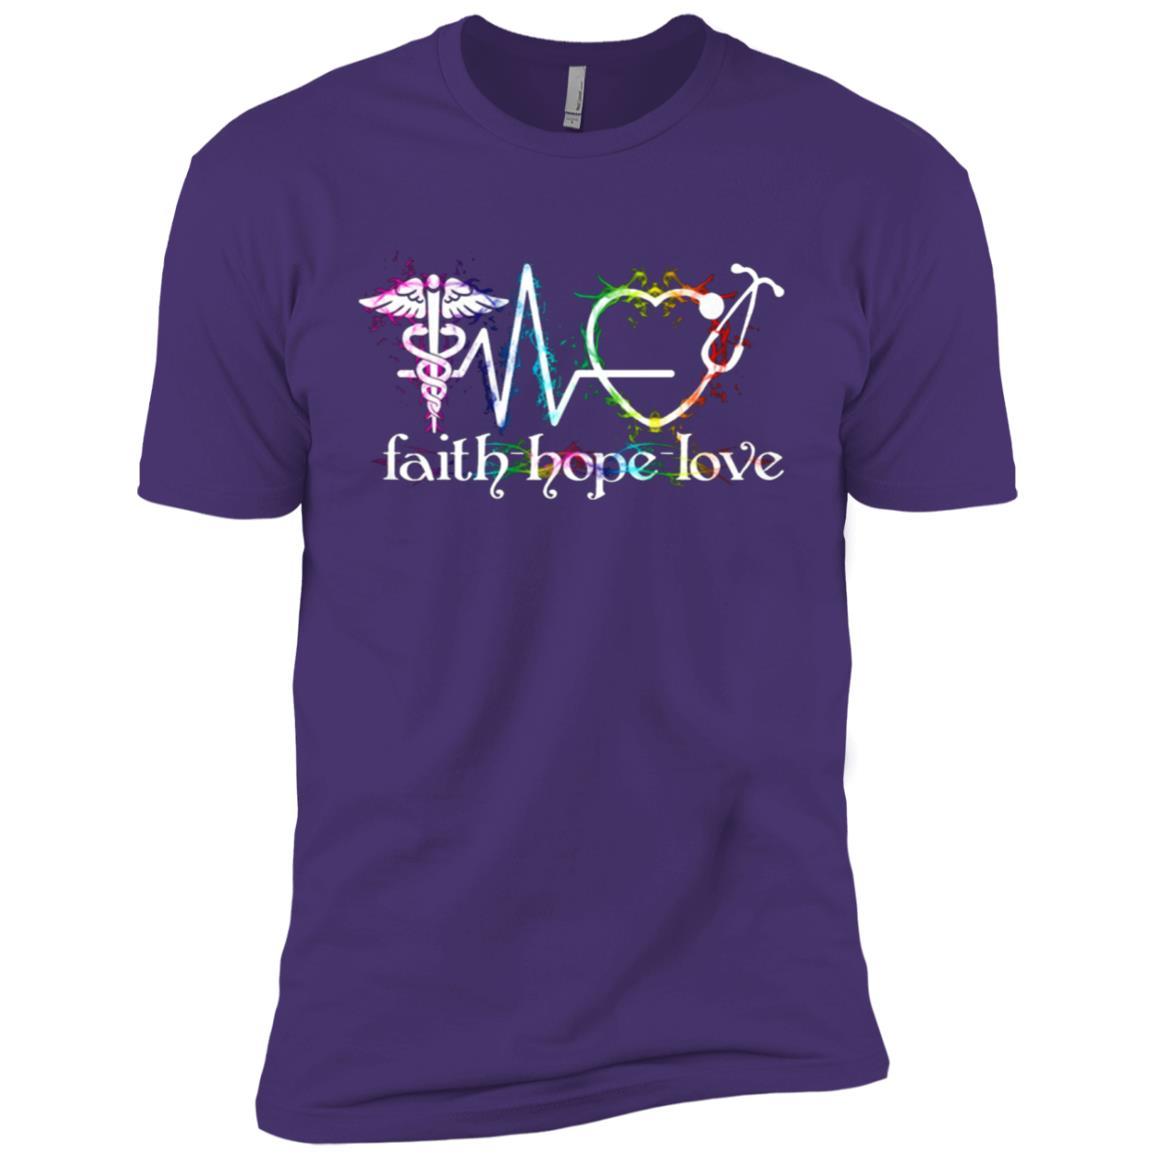 Nurse Everyday Superhero Fun Medical Men Short Sleeve T-Shirt